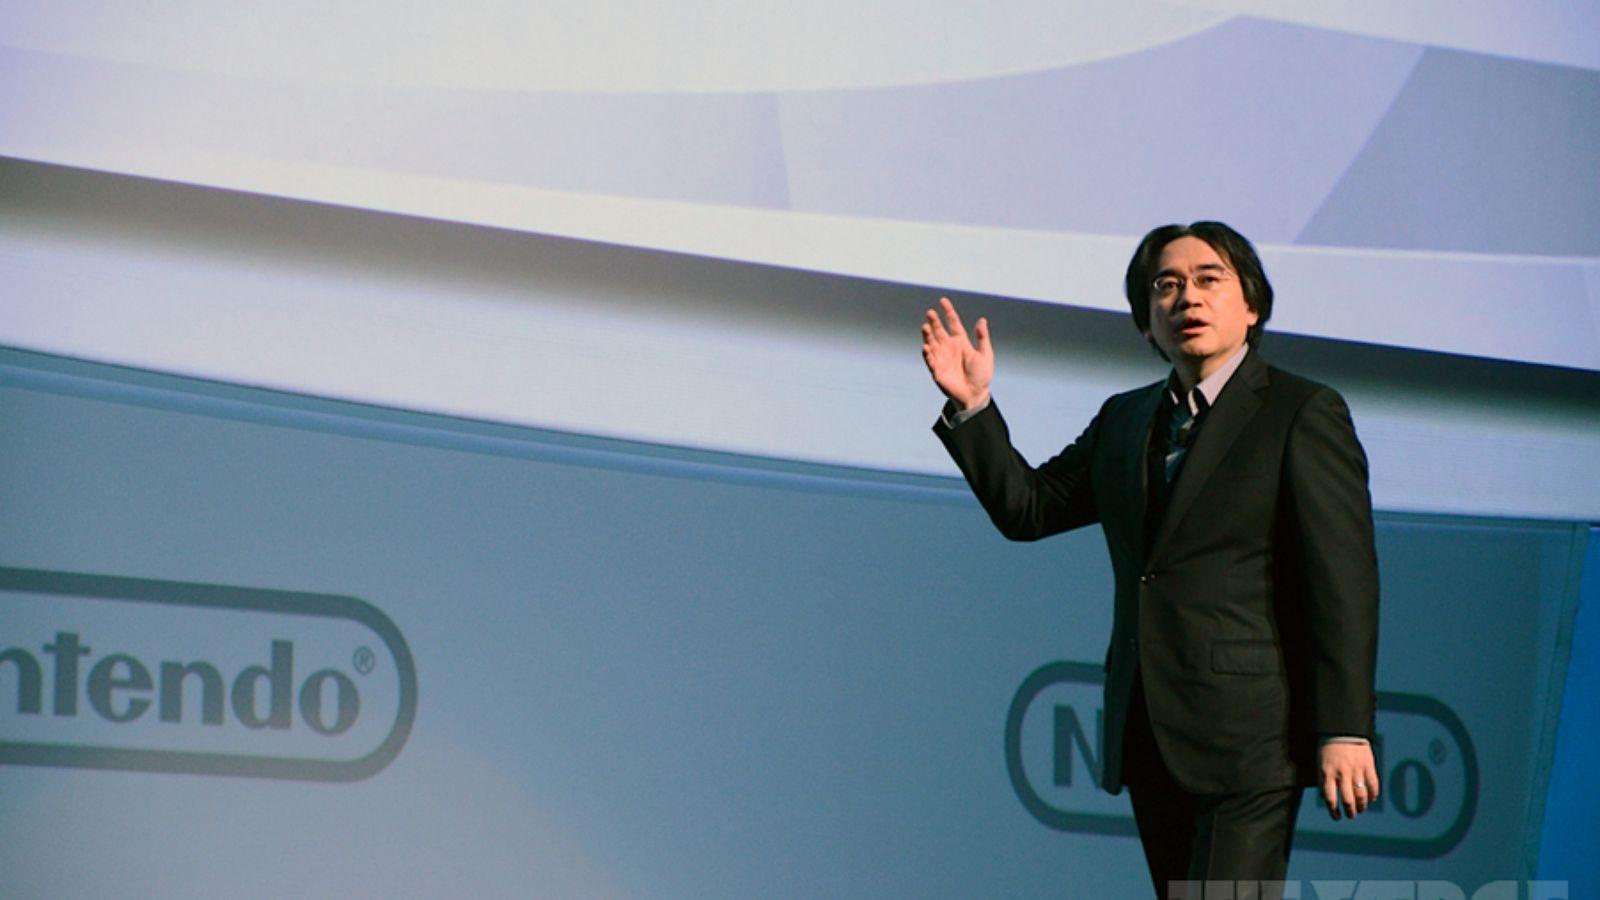 Nintendo-E3-2011-satoru-iwata-ls-waving-rm-verge-1000_gallery_post